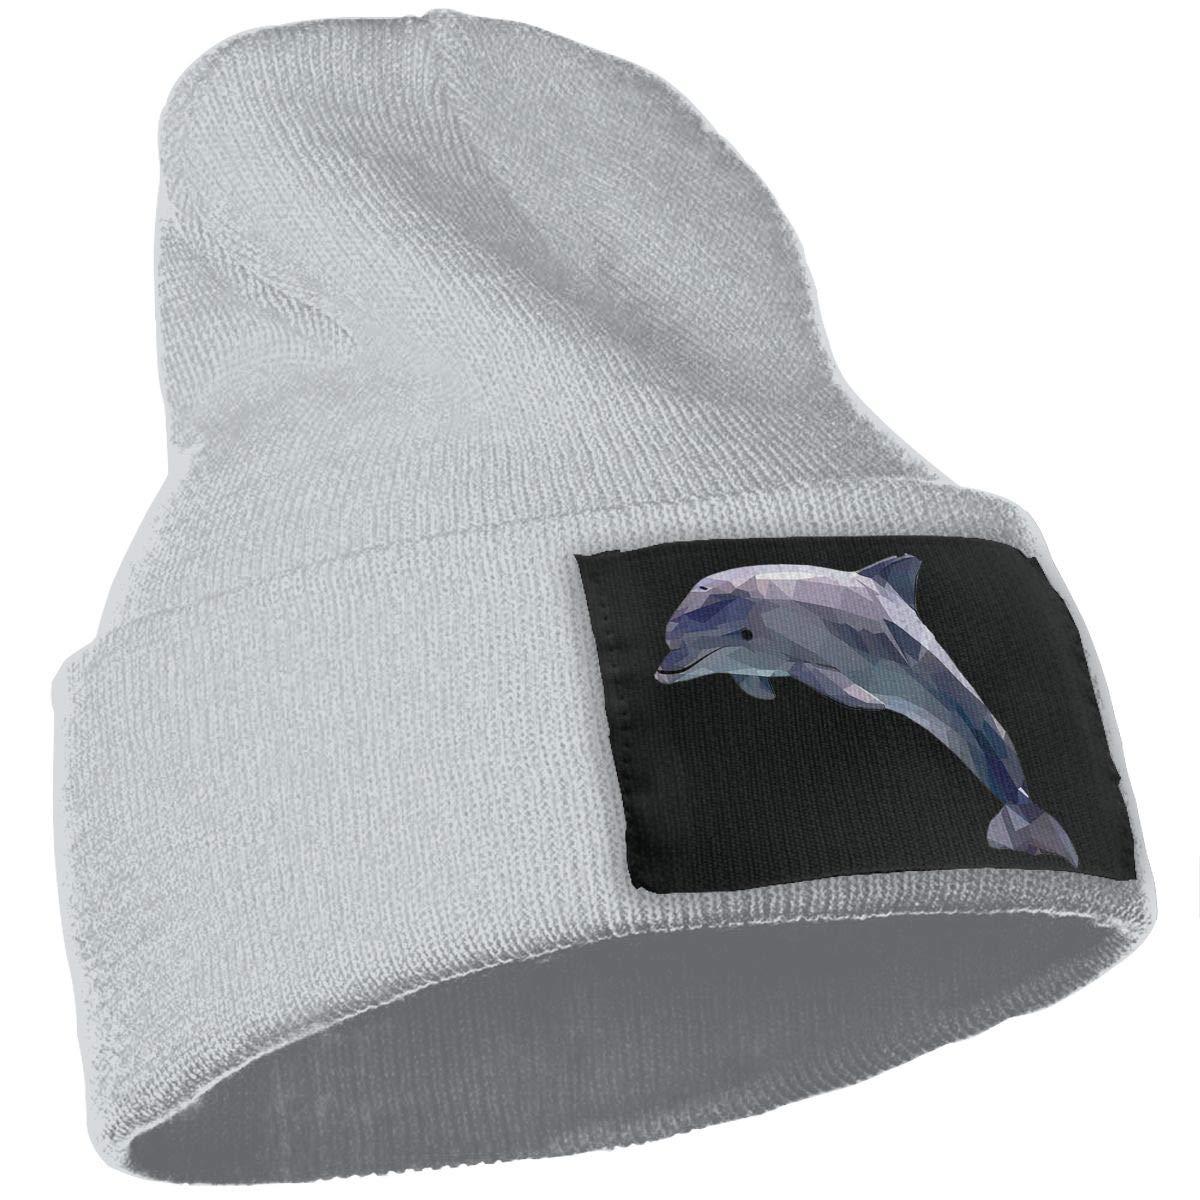 Dolphin Warm Winter Hat Knit Beanie Skull Cap Cuff Beanie Hat Winter Hats for Men /& Women